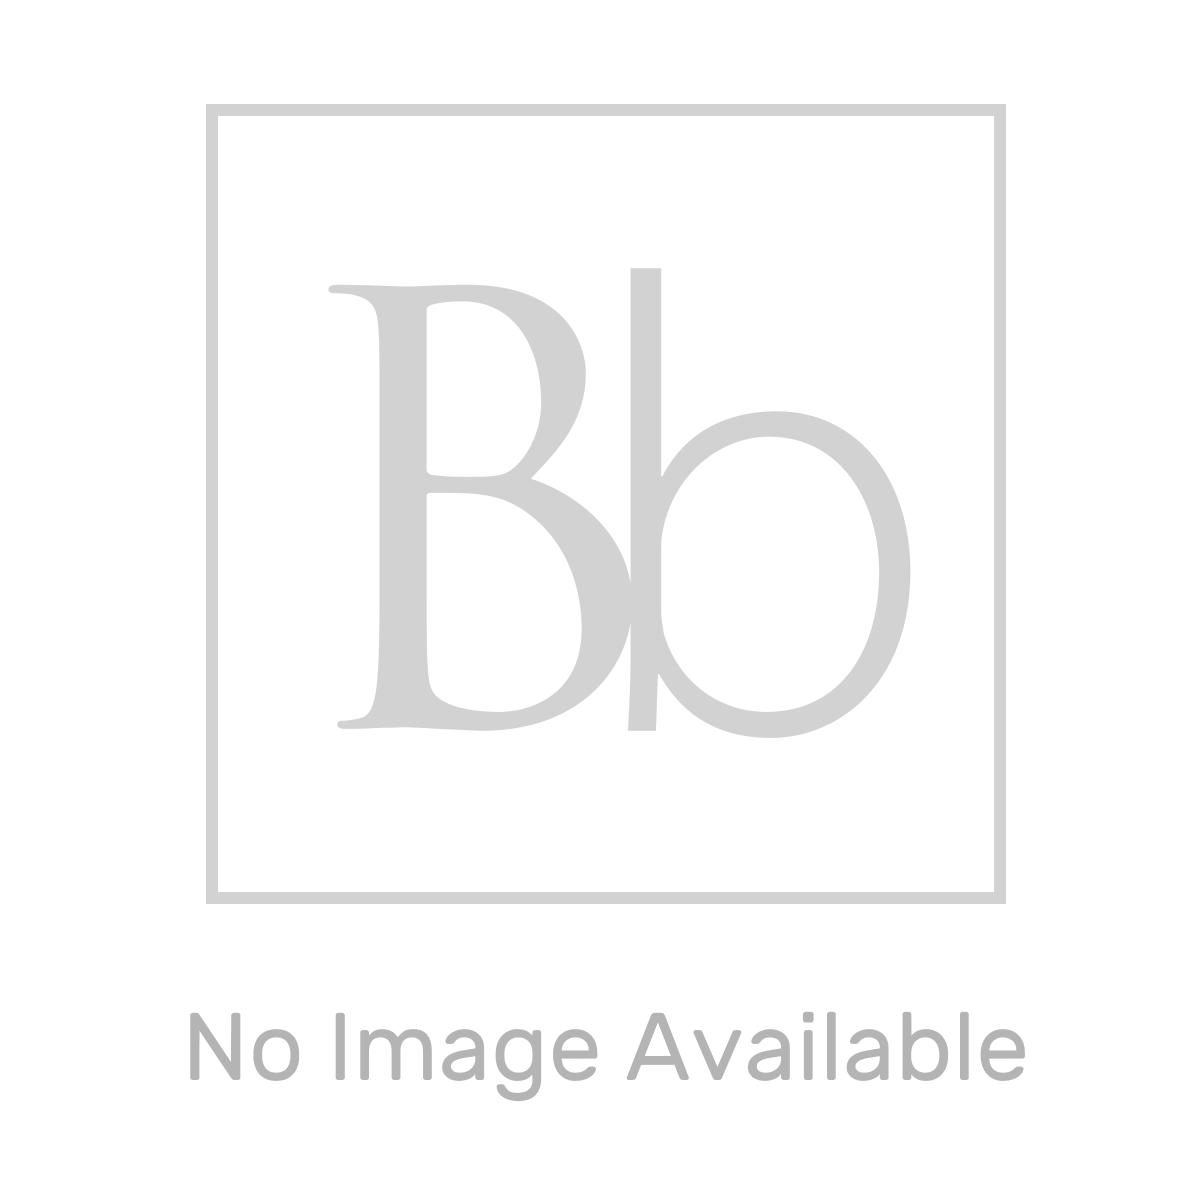 Sensio TrioTone Cube Clear Glass 2